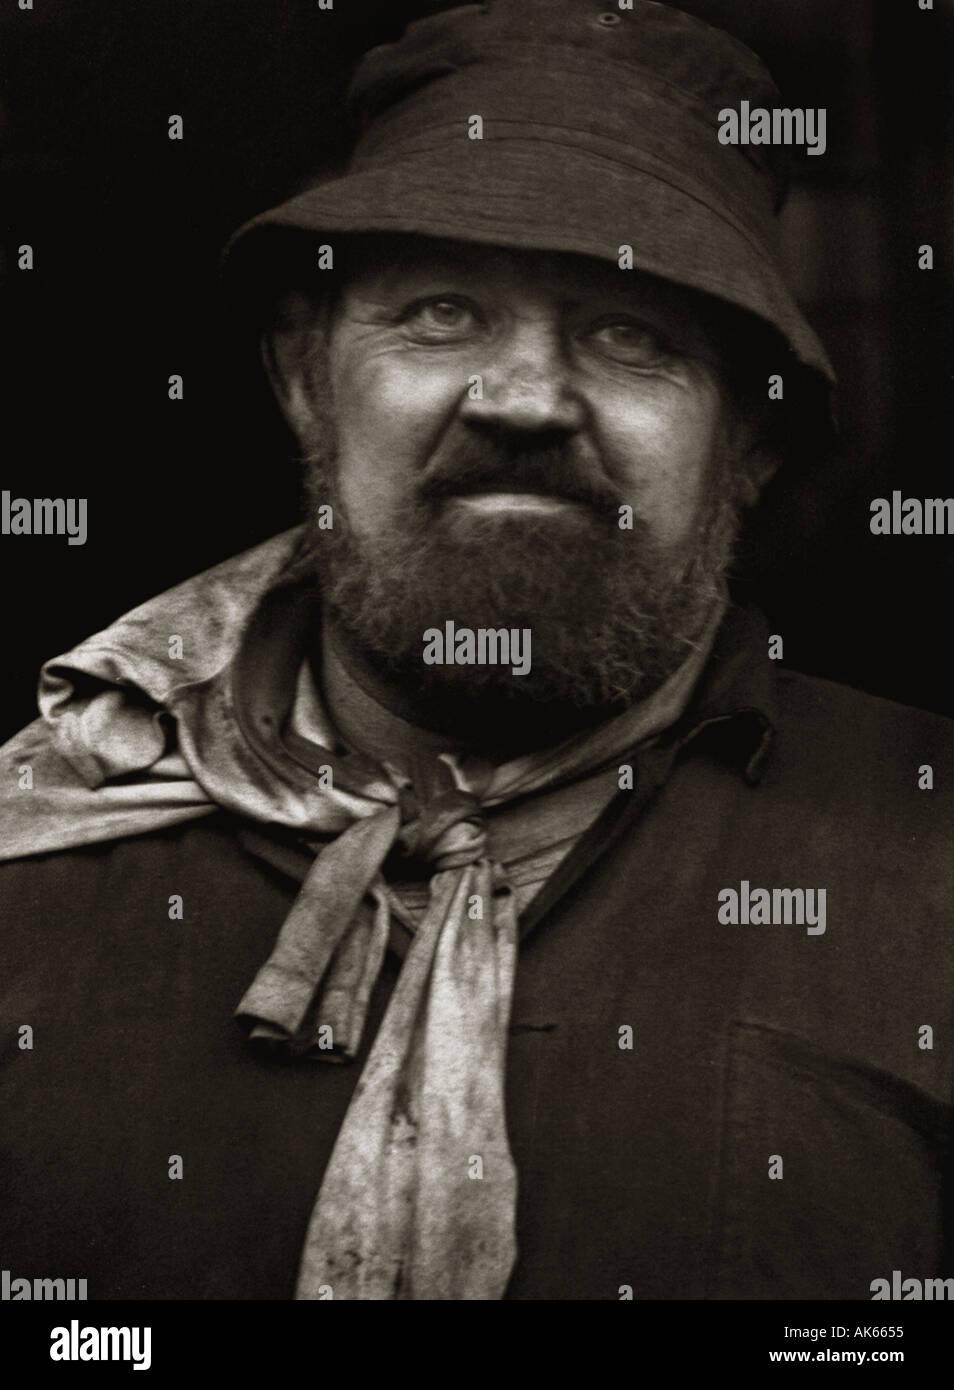 Cornish Tin miner portrait - Stock Image